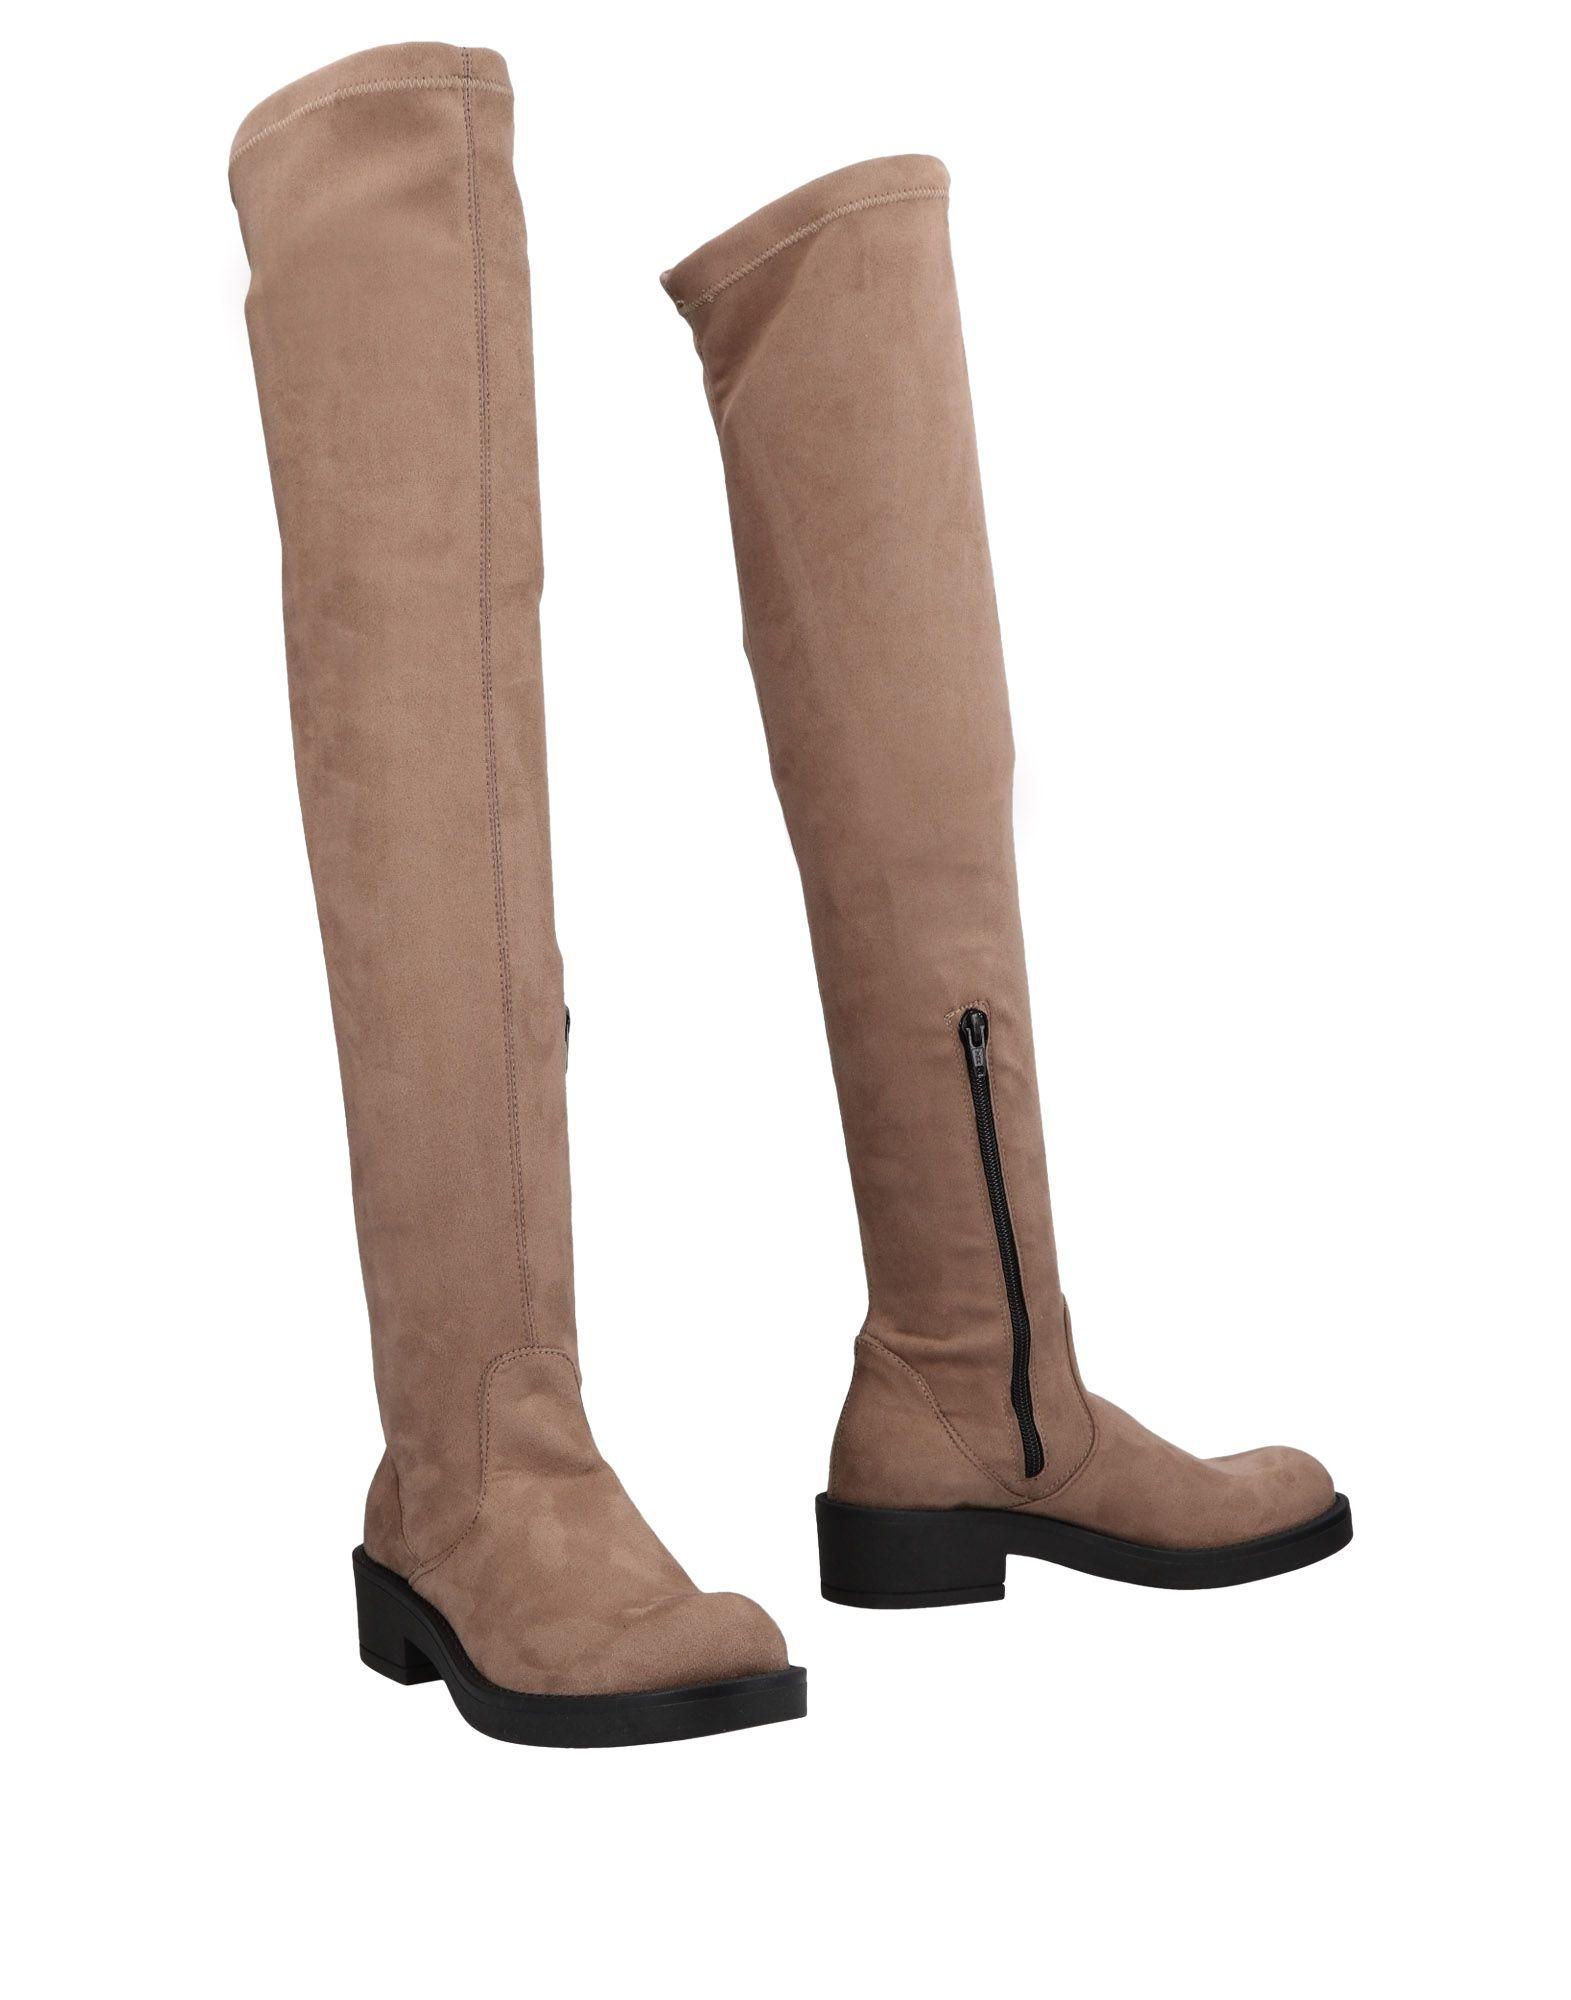 Stivali Unlace Donna - Acquista online su